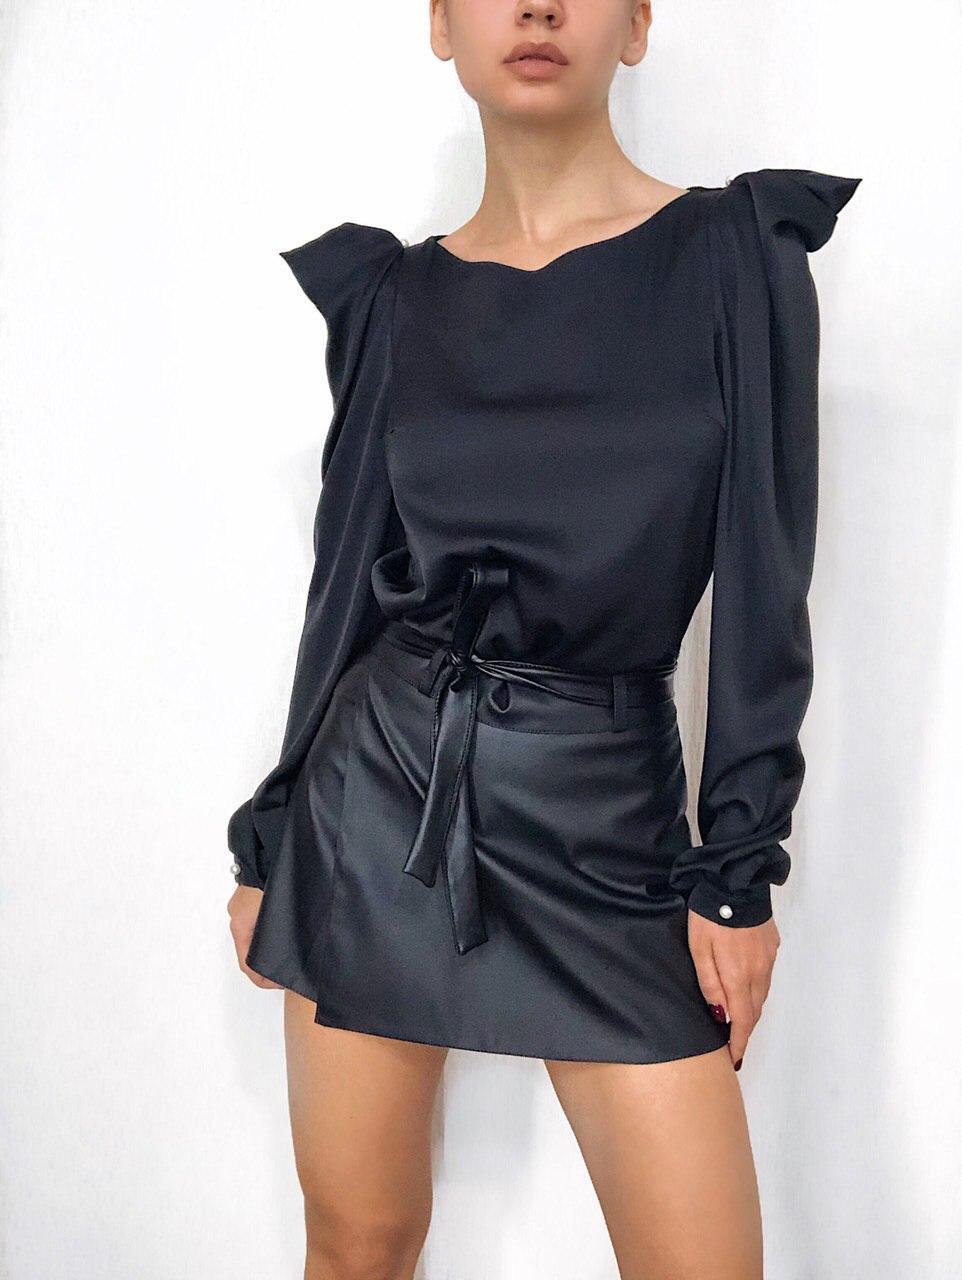 Симпатичная женская блузка с рукавами-фонариками